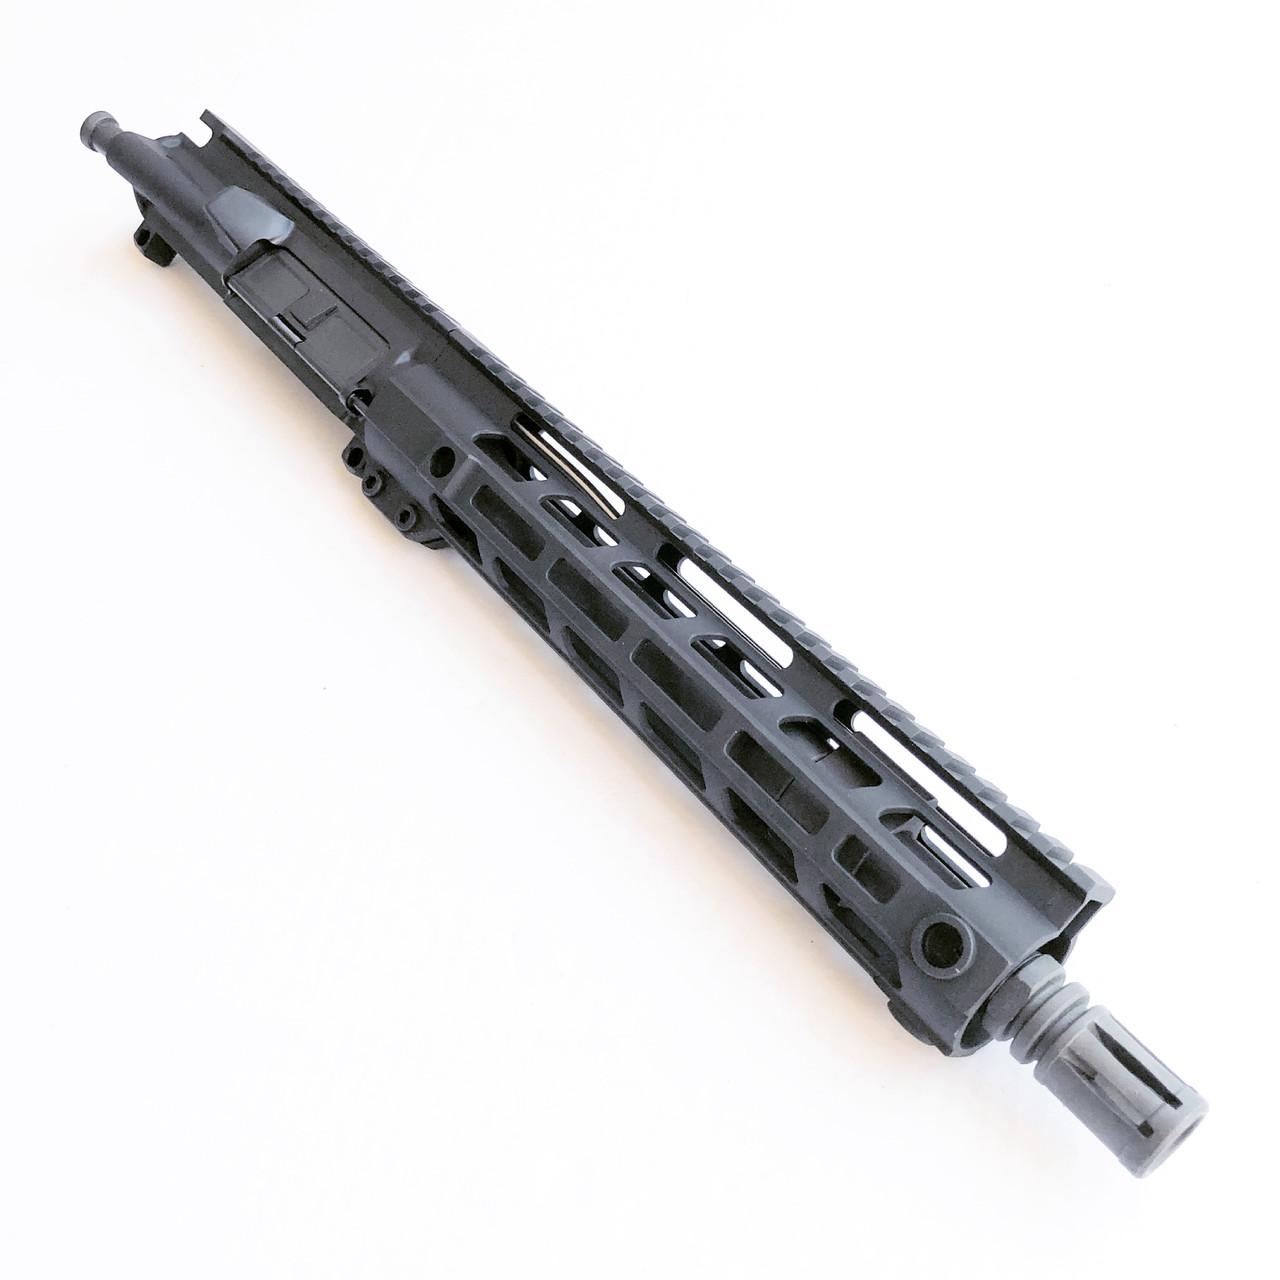 MCS AR-15 Pistol Upper, 5.56 NATO, 10.5'' Barrel, 1:7 Twist, Carbine Gas System